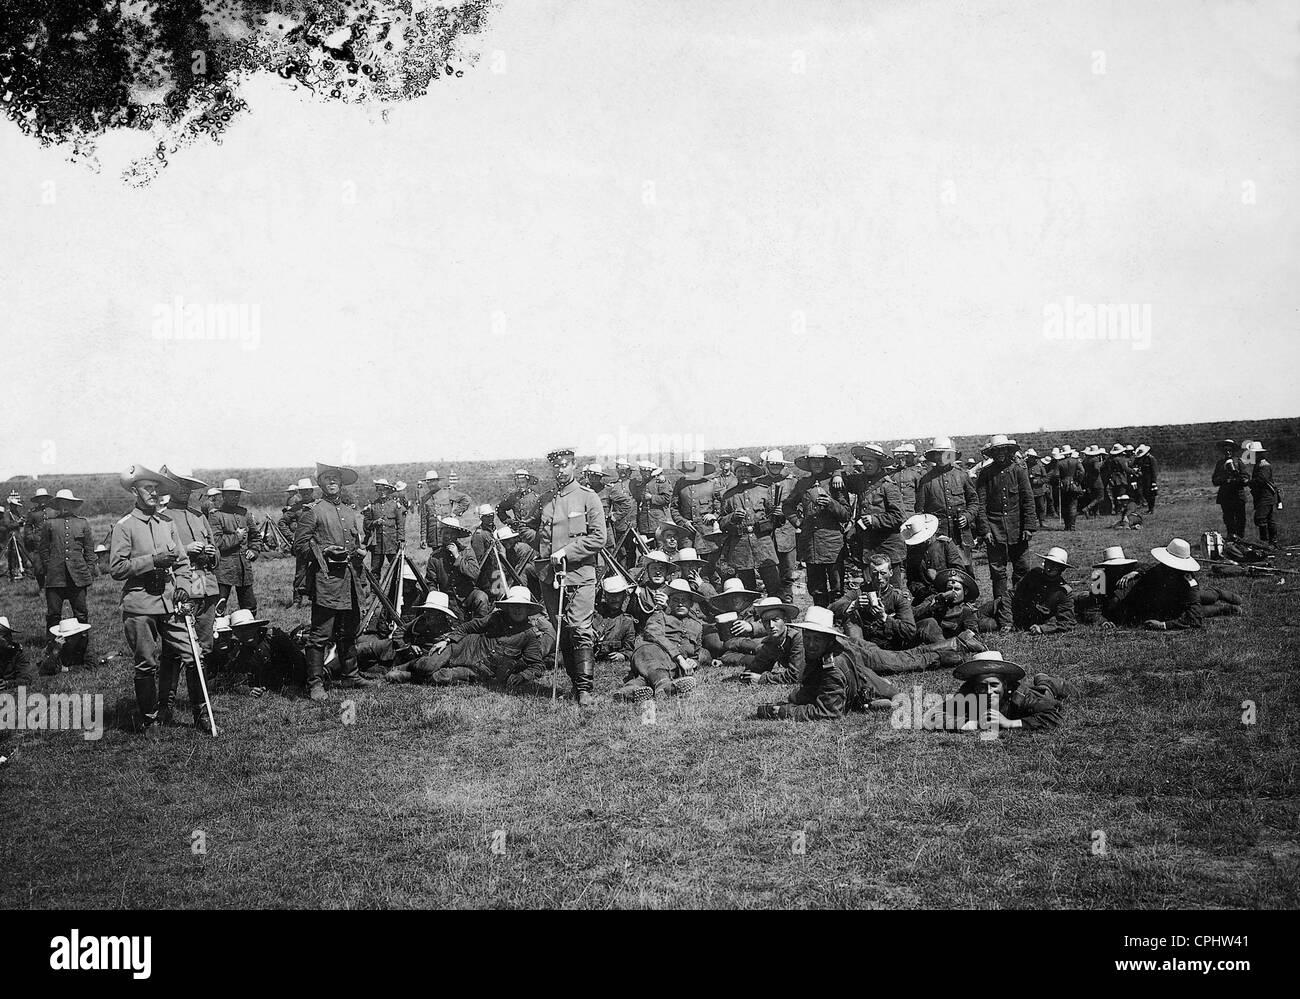 German volunteers during the Boxer Rebellion, 1900 - Stock Image